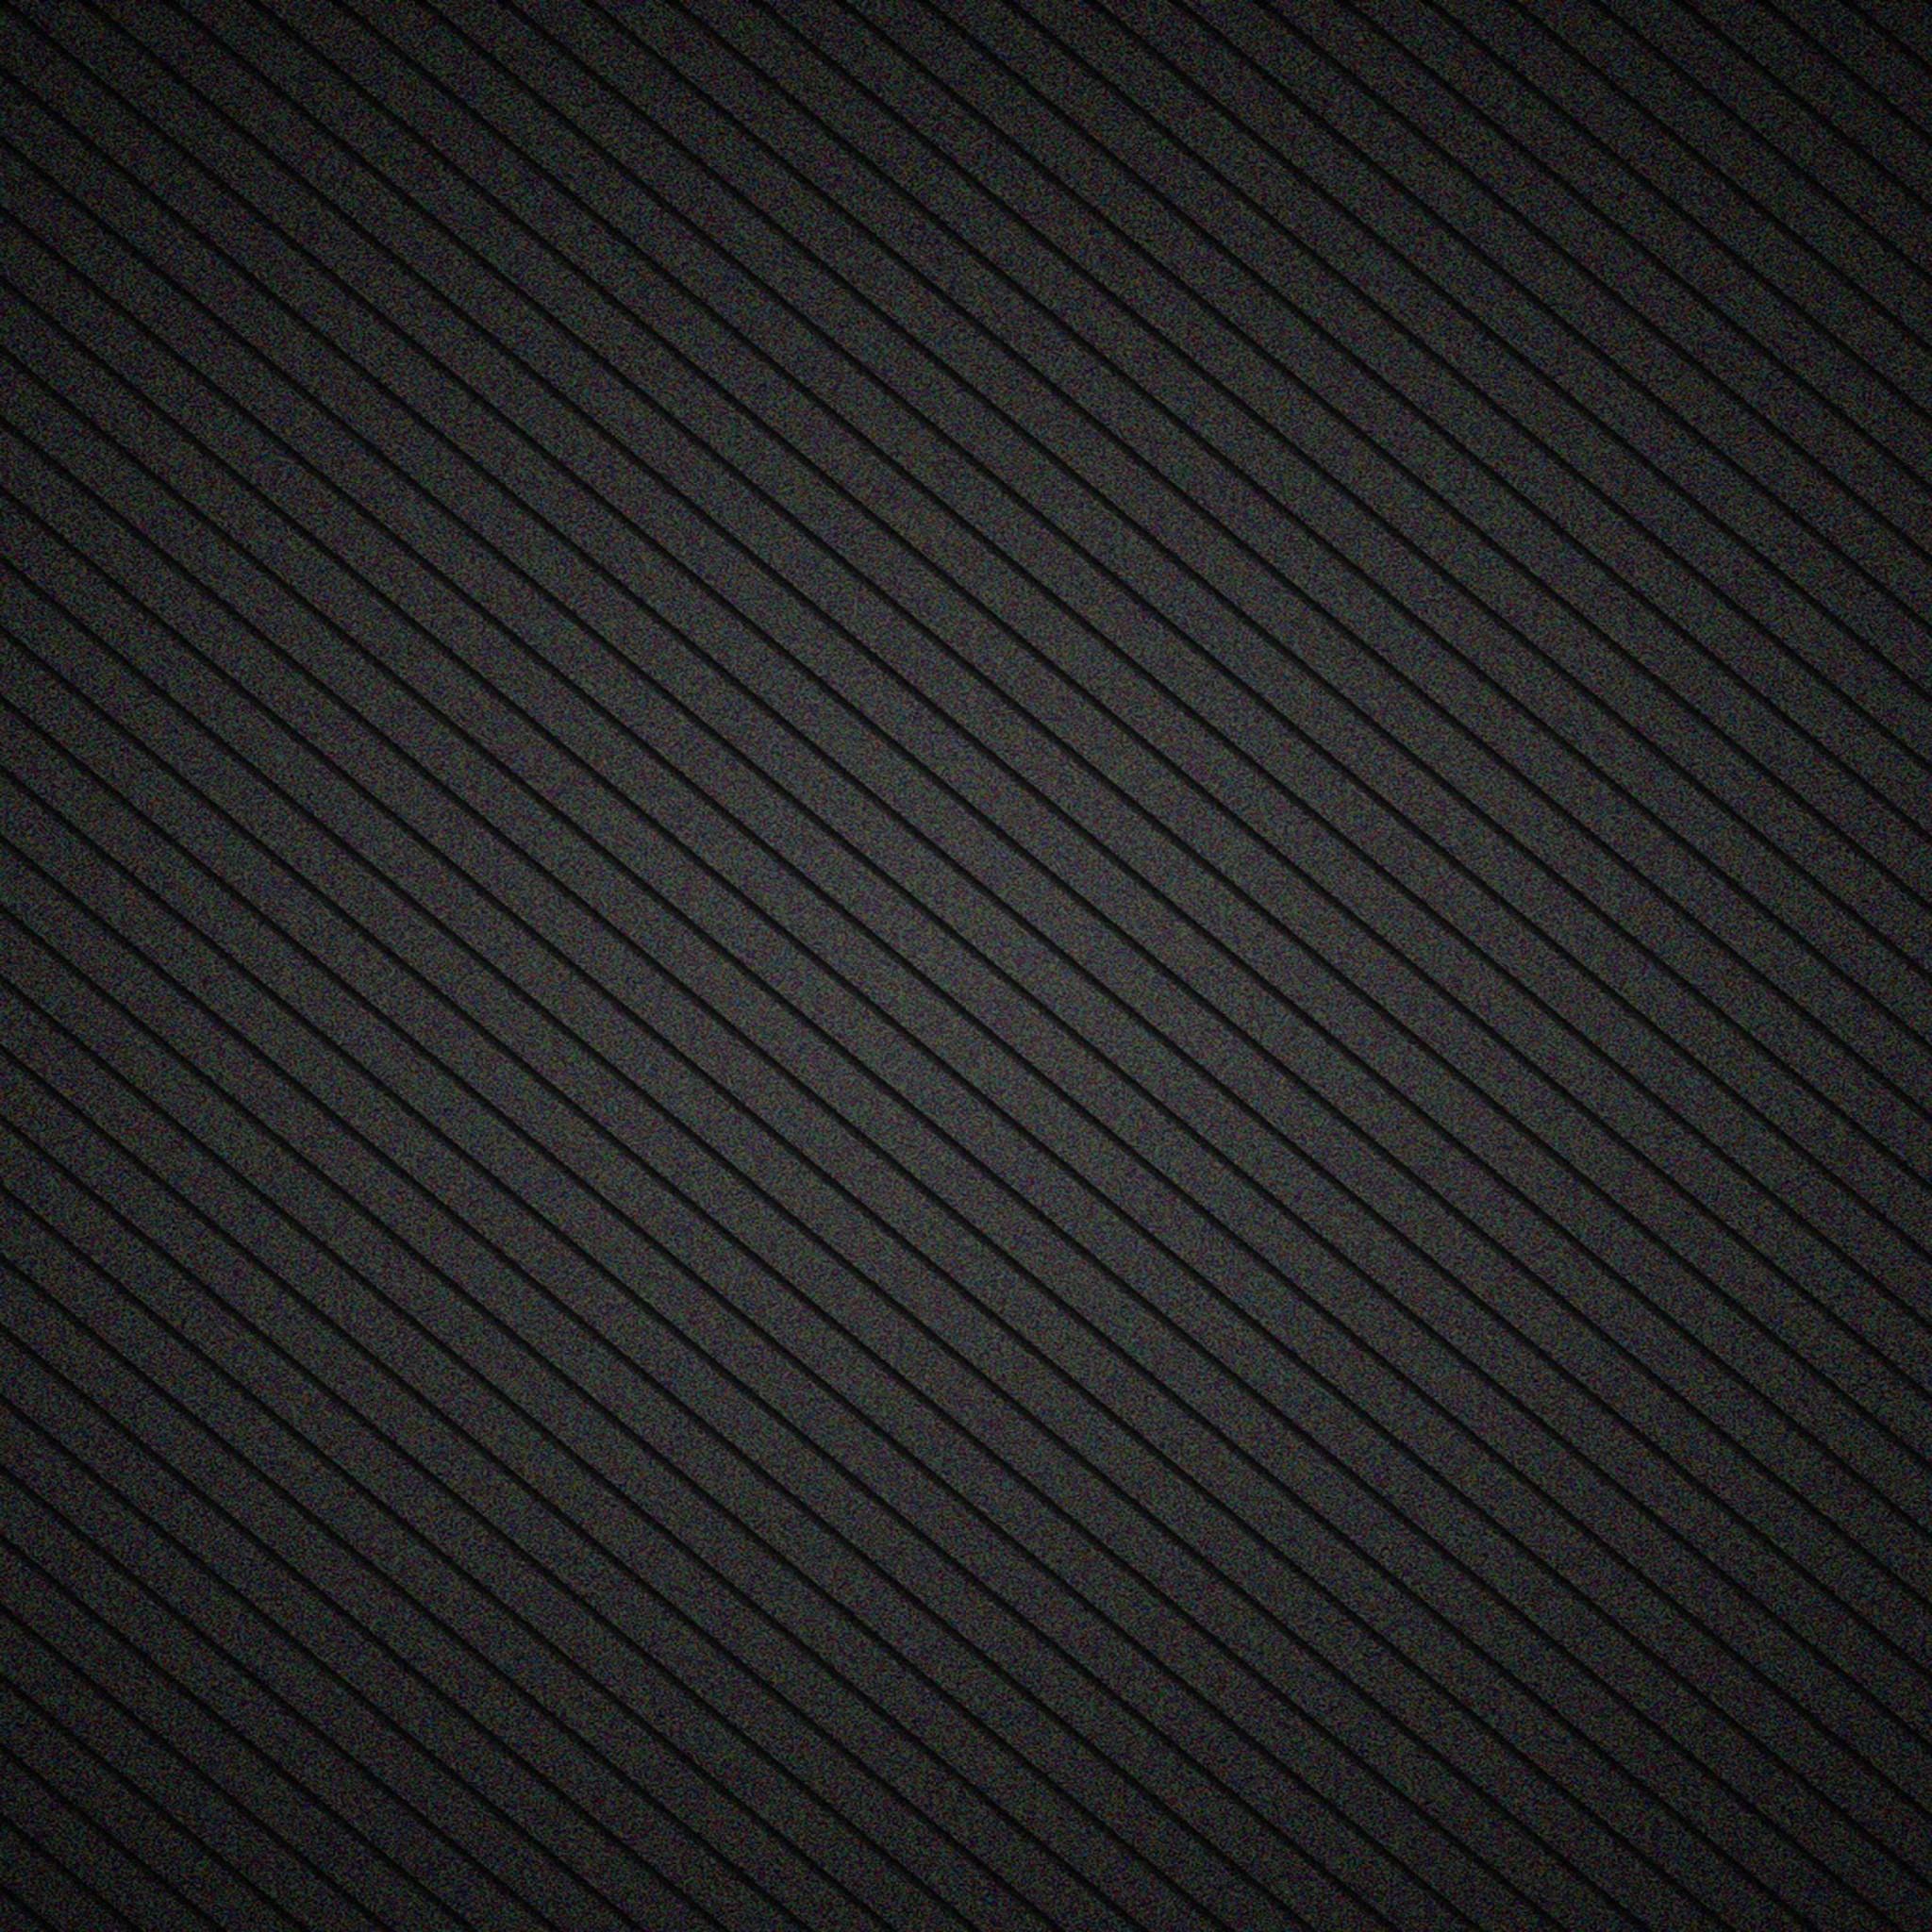 File Name ipad ios7 00241 dd2674cdbf5b5fa53762926c4c9fd7db rawjpg 2048x2048